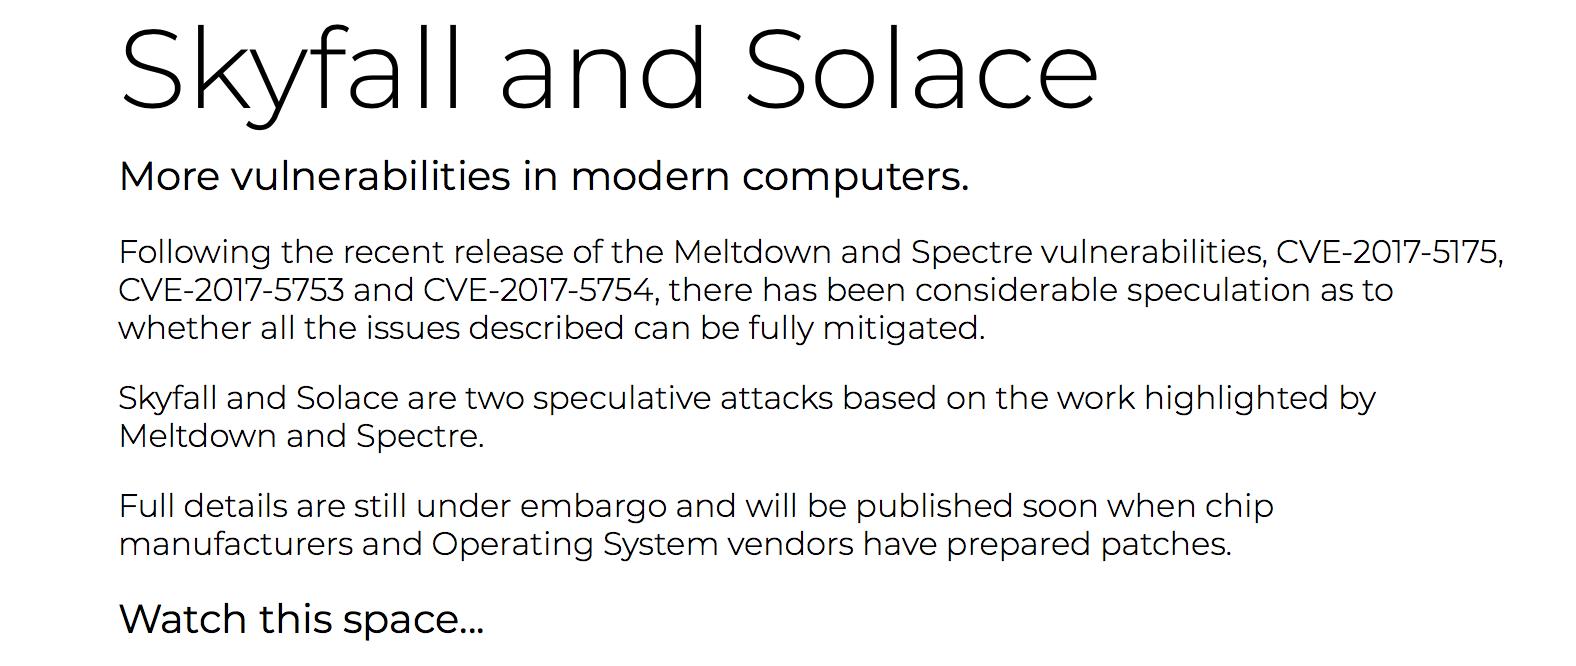 Забудьте уязвимости Meltdown/Spectre, на подходе пачка новых «сюрпризов»